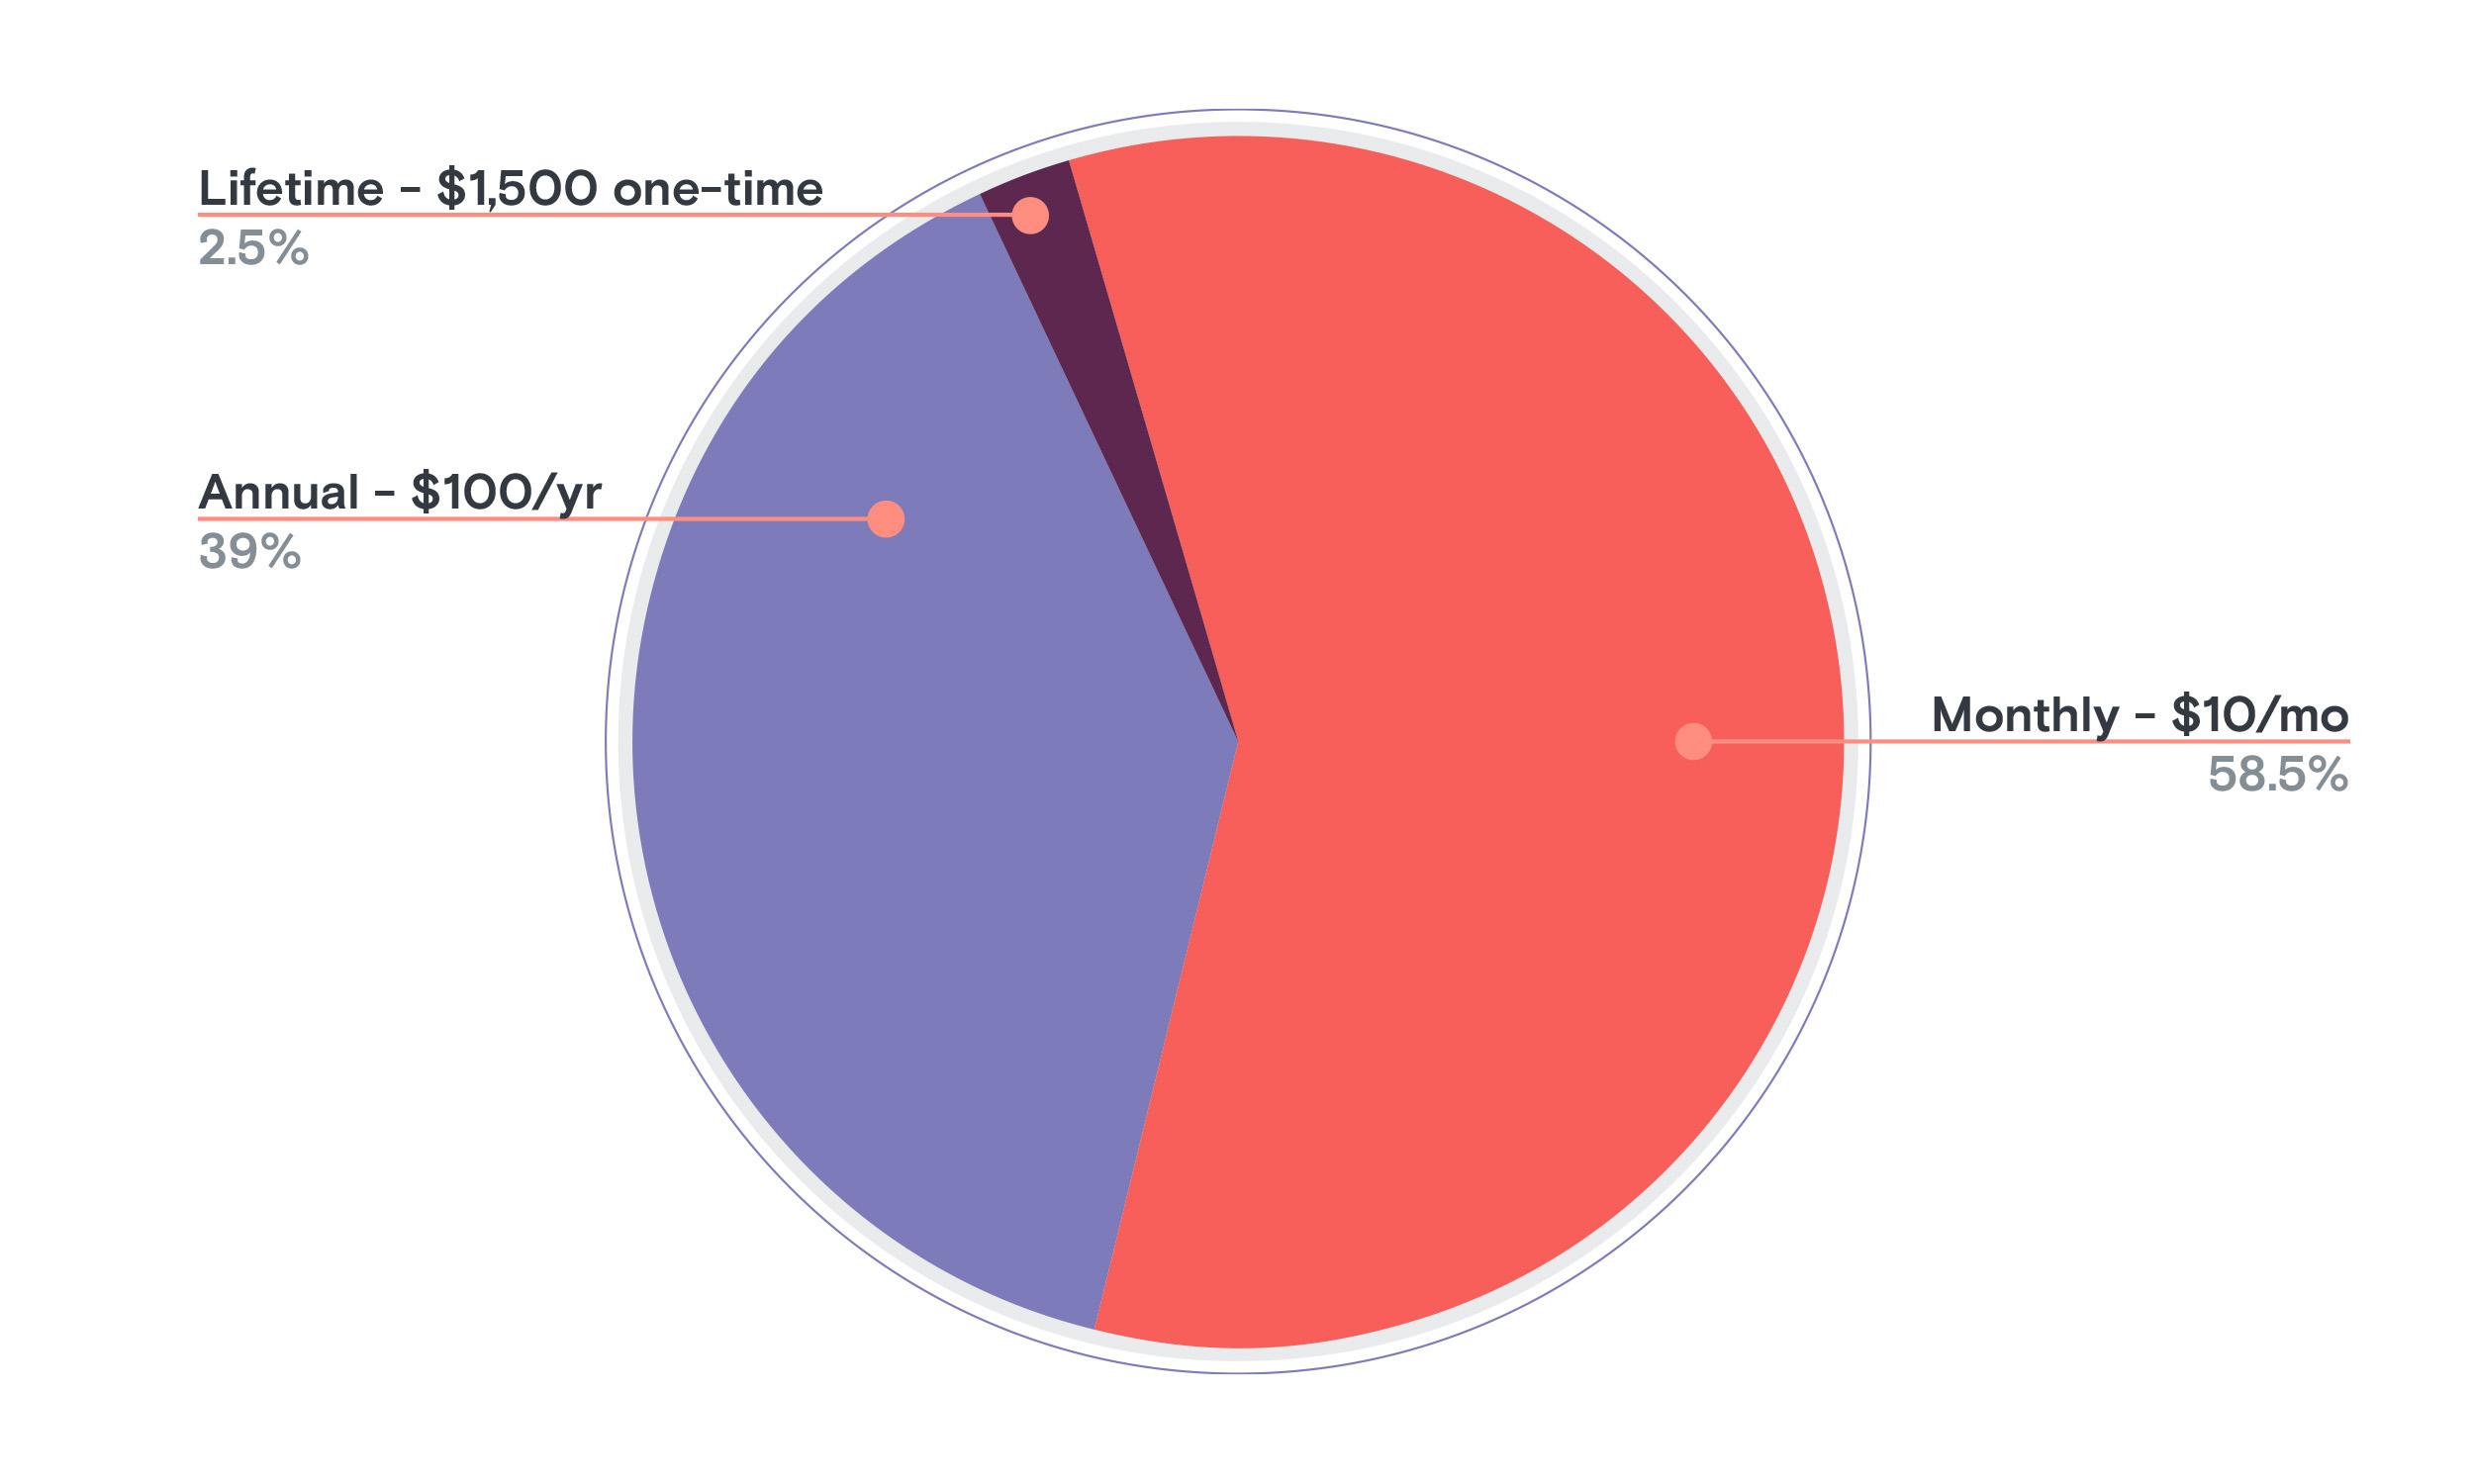 Pie chart: Breaking Points subscriber breakdown by plan type